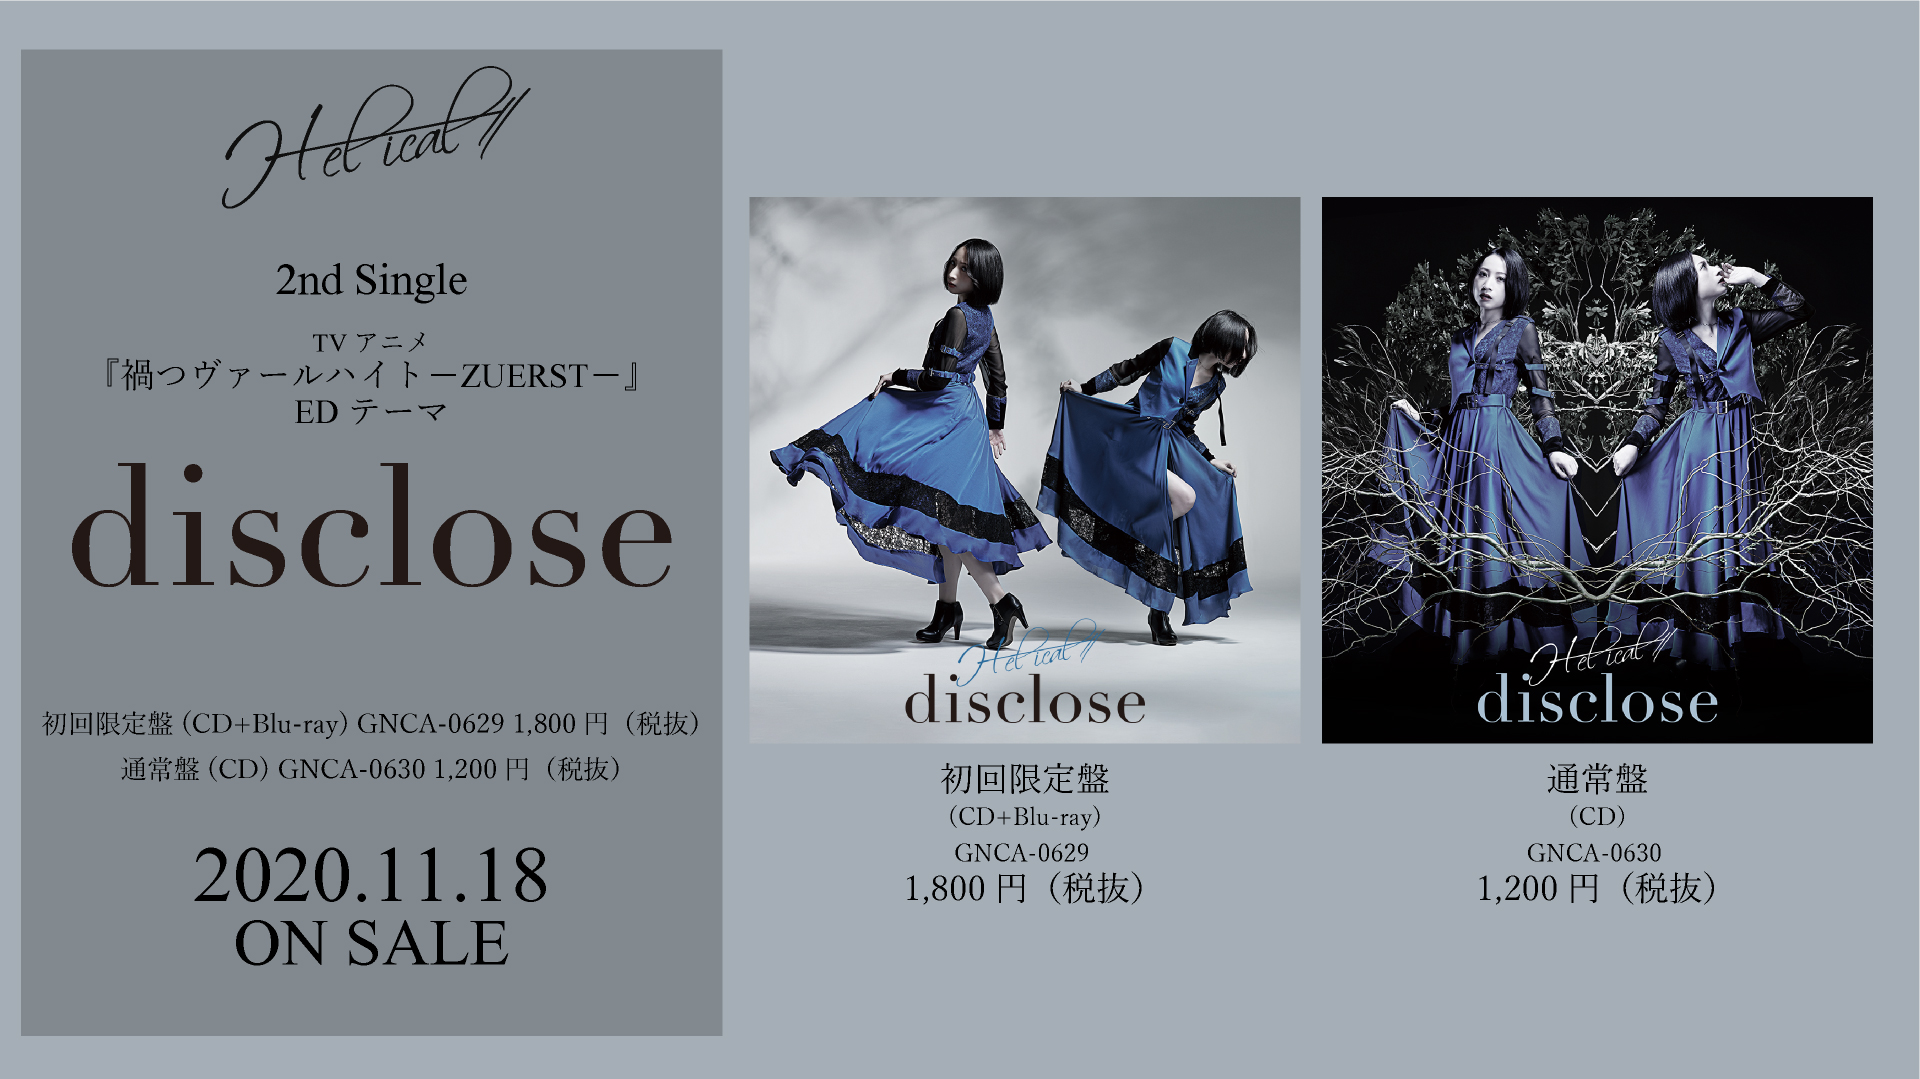 H-el-ical//の2nd Single「disclose」のジャケット写真公開!